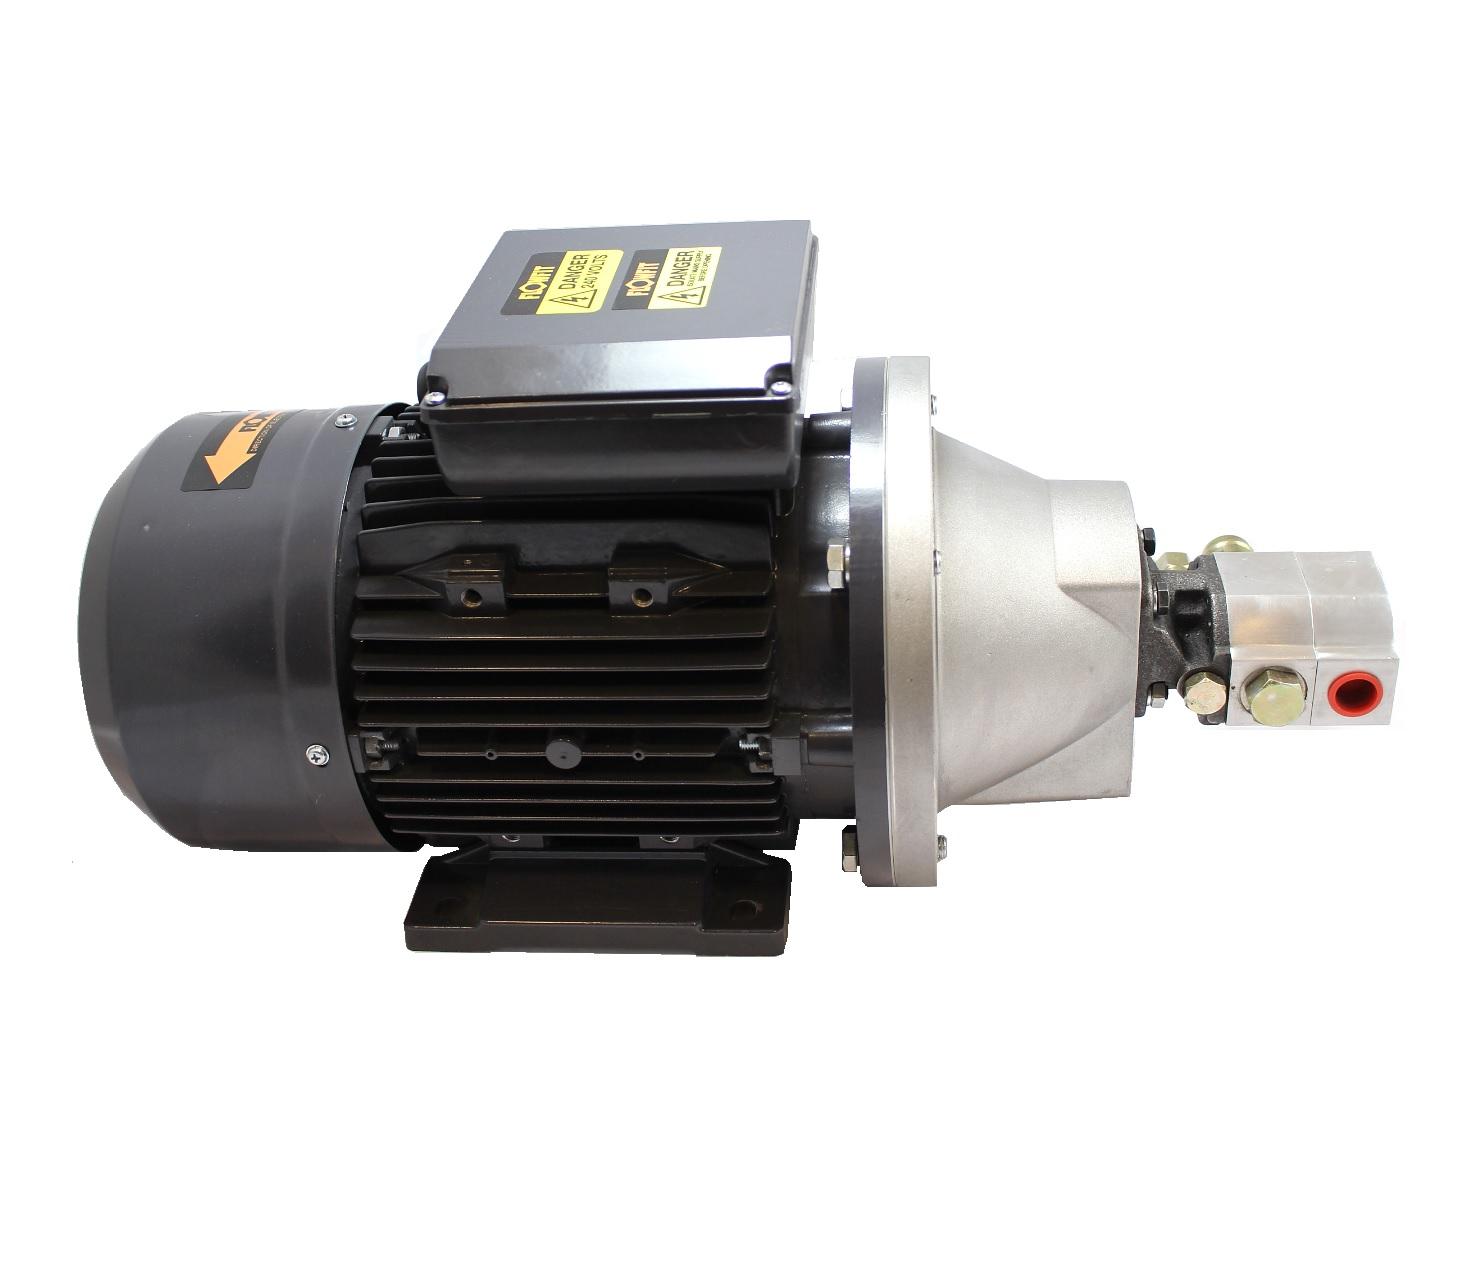 Hydraulic 3 7kw 240v 1 ph motor pumpset with 8gpm hi low for Electric motor hydraulic pump